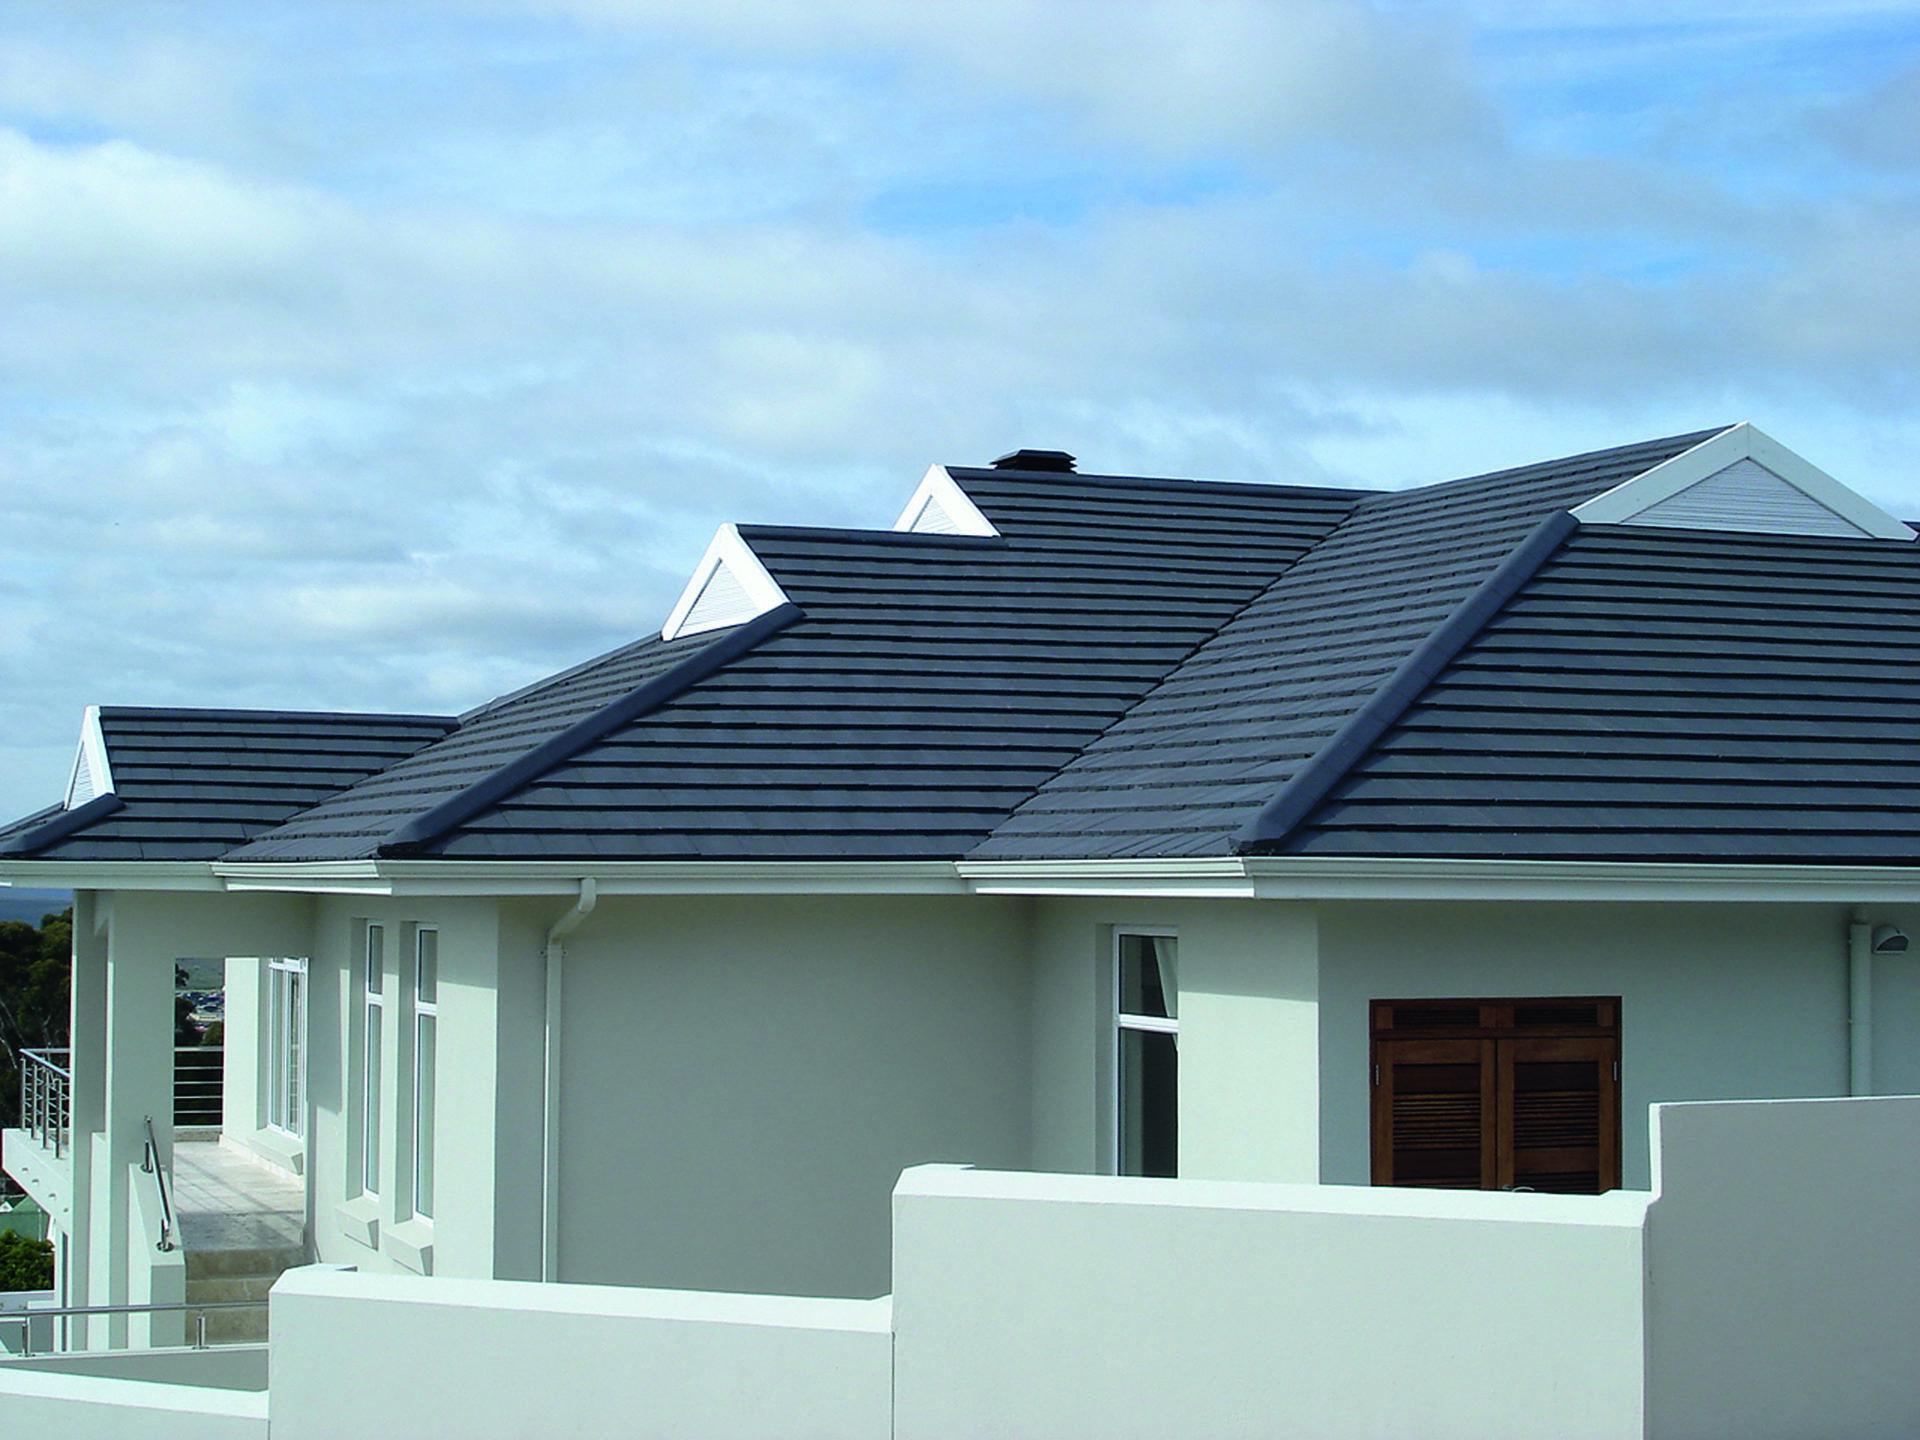 Marley Modern Concrete Roof Tile Marley Roofing In 2020 Roof Tiles Marley Roof Tiles Concrete Roof Tiles